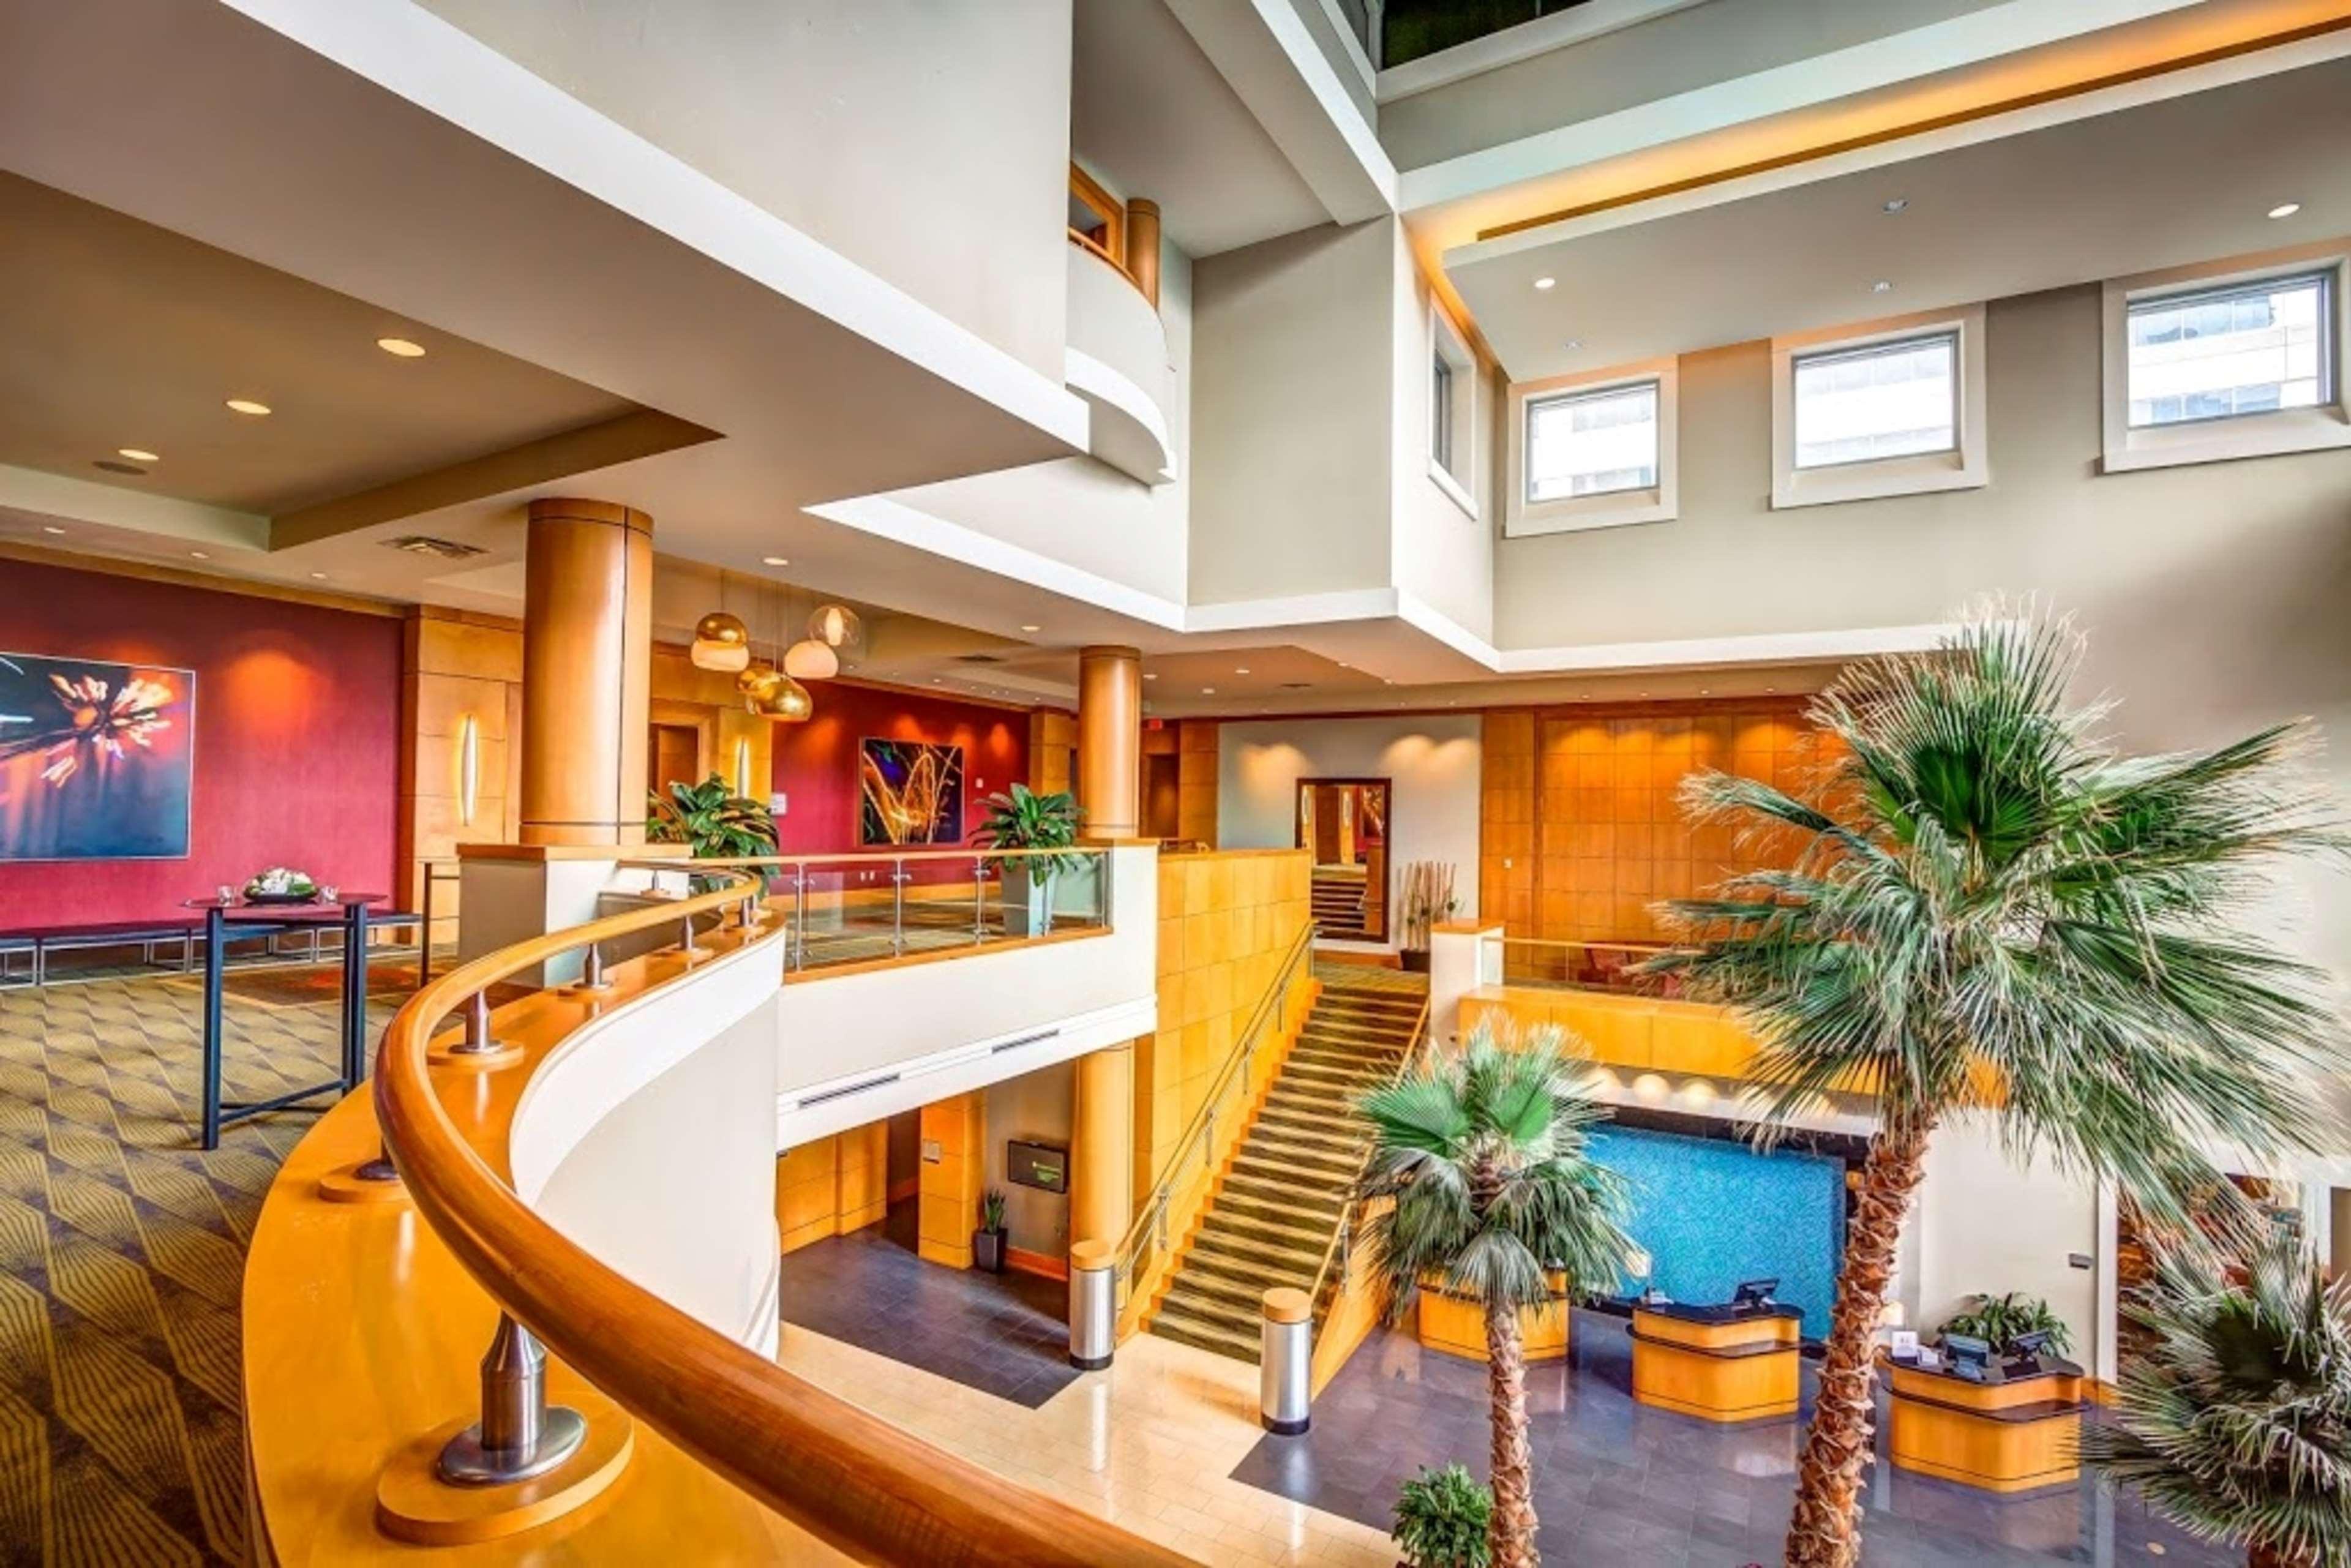 Embassy Suites by Hilton Houston Energy Corridor image 0